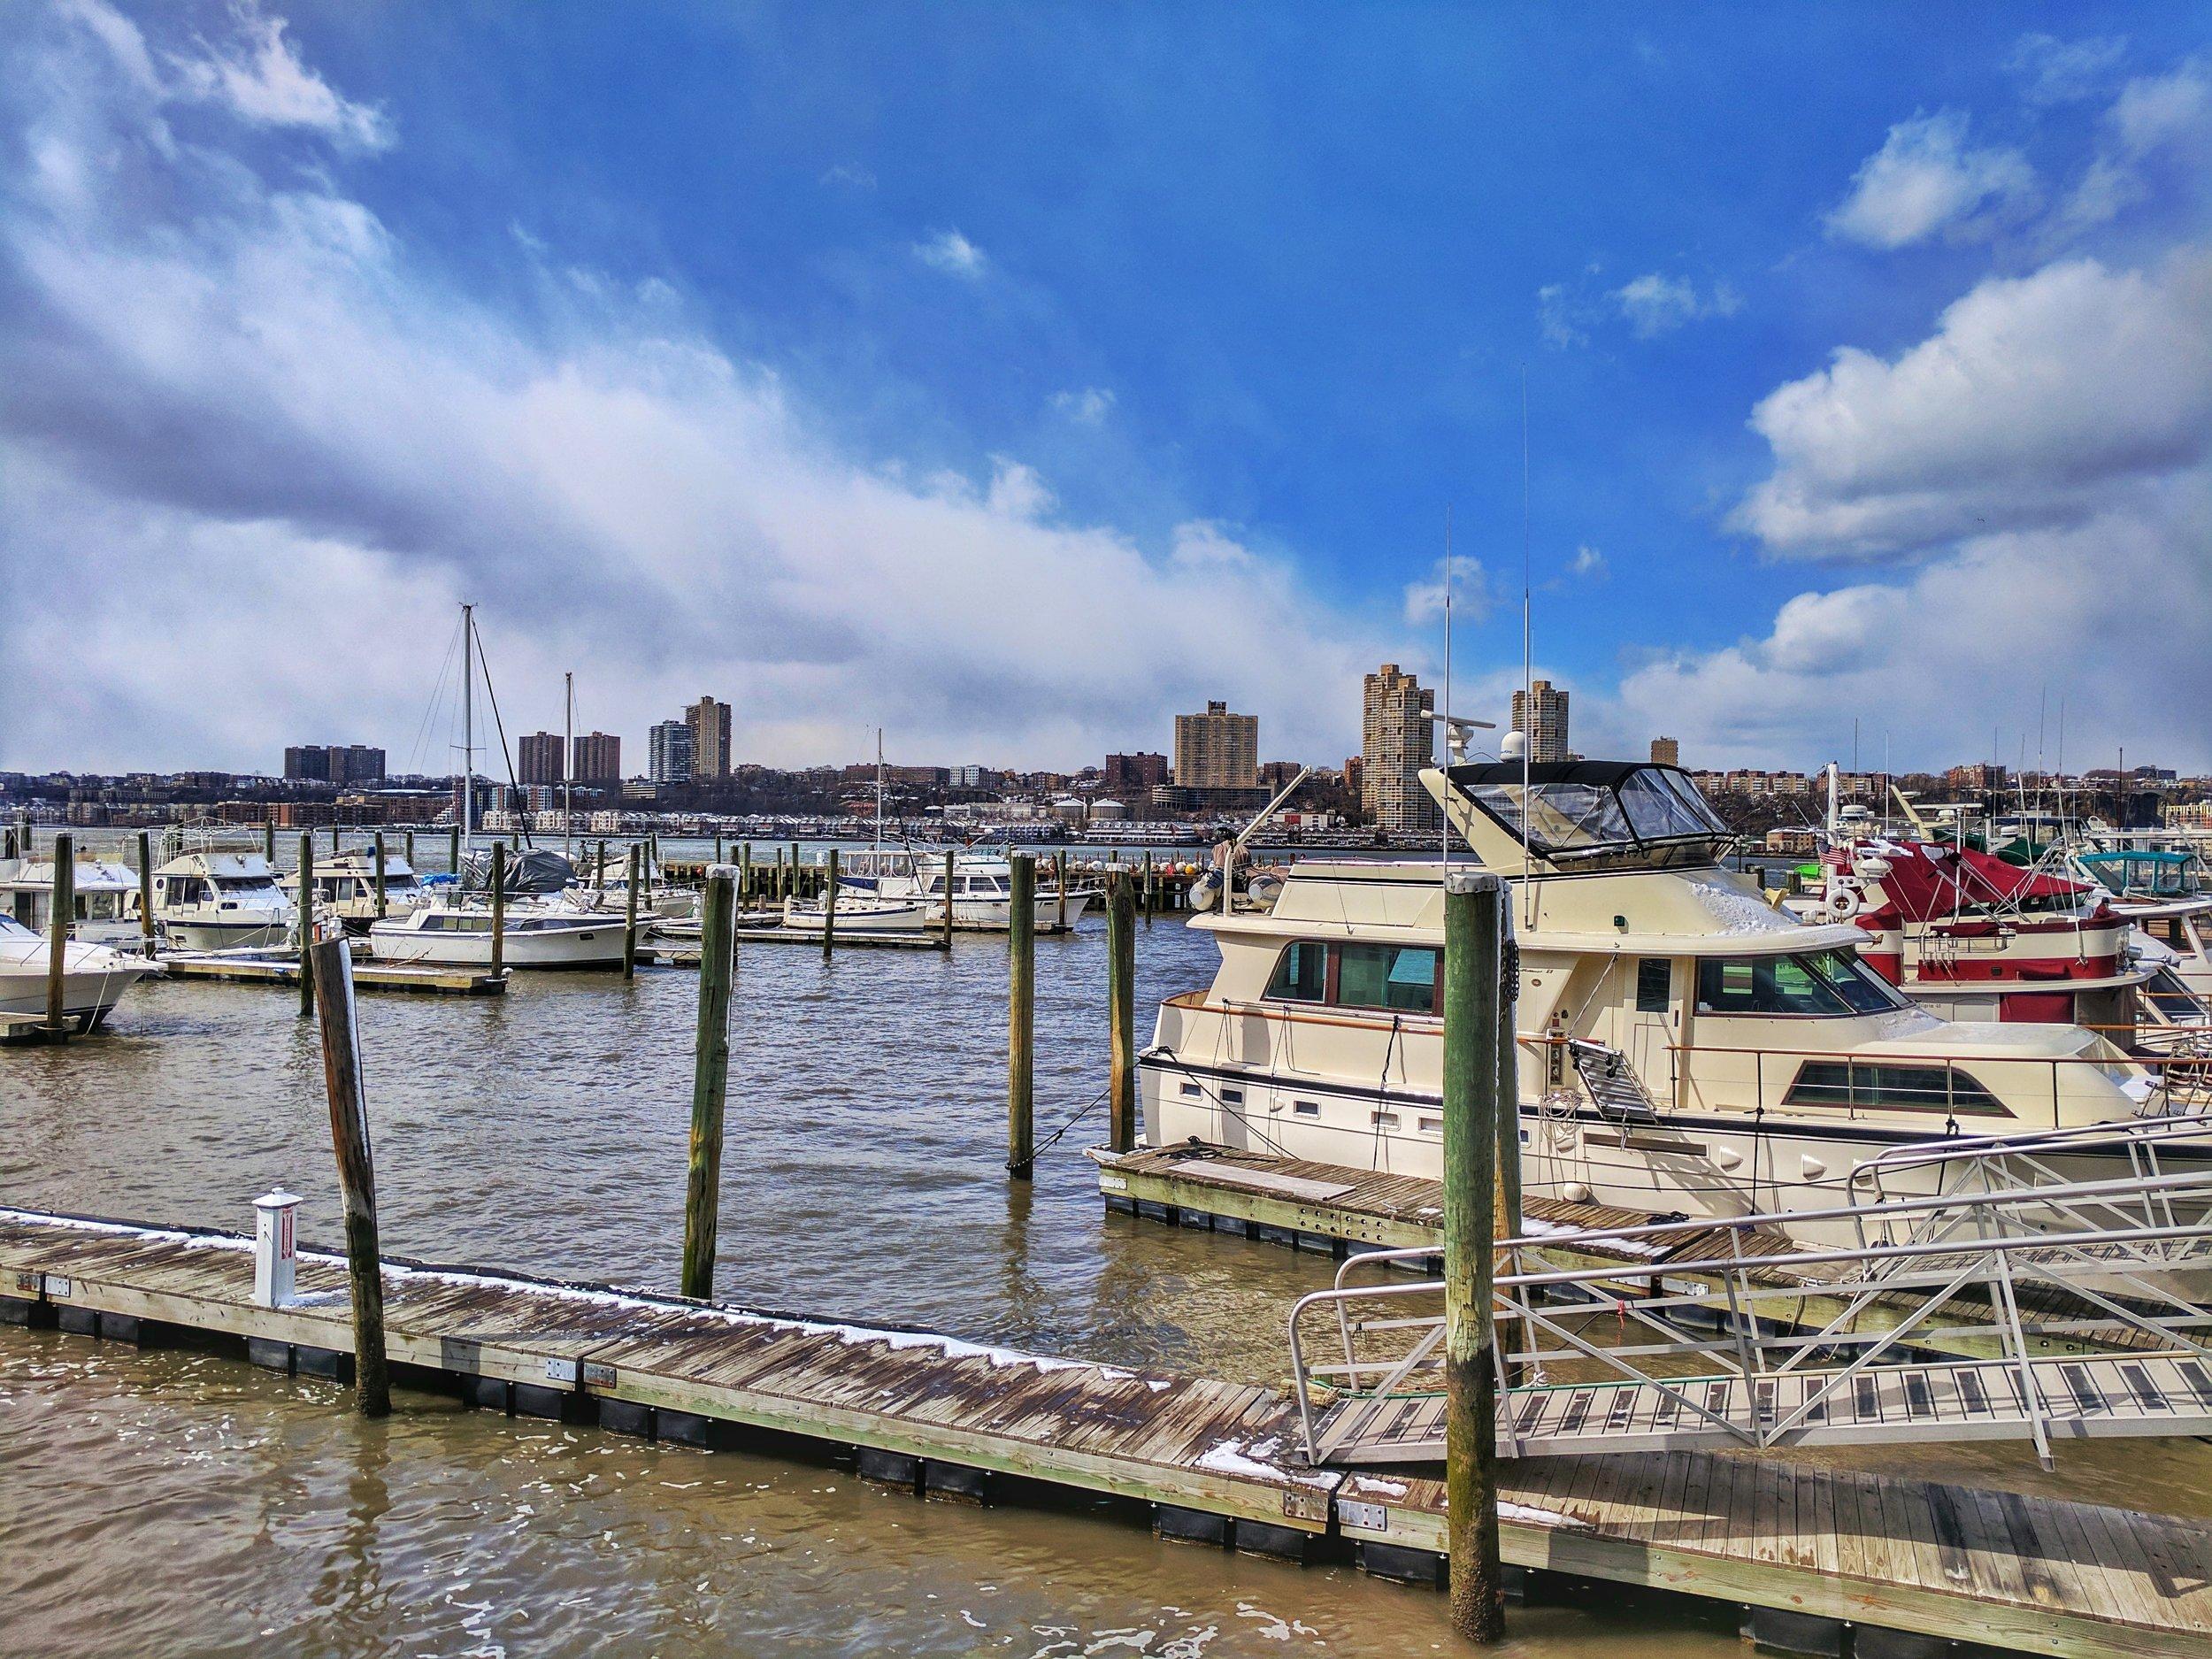 Location: 79th Street at the Hudson River (along Riverside Park)